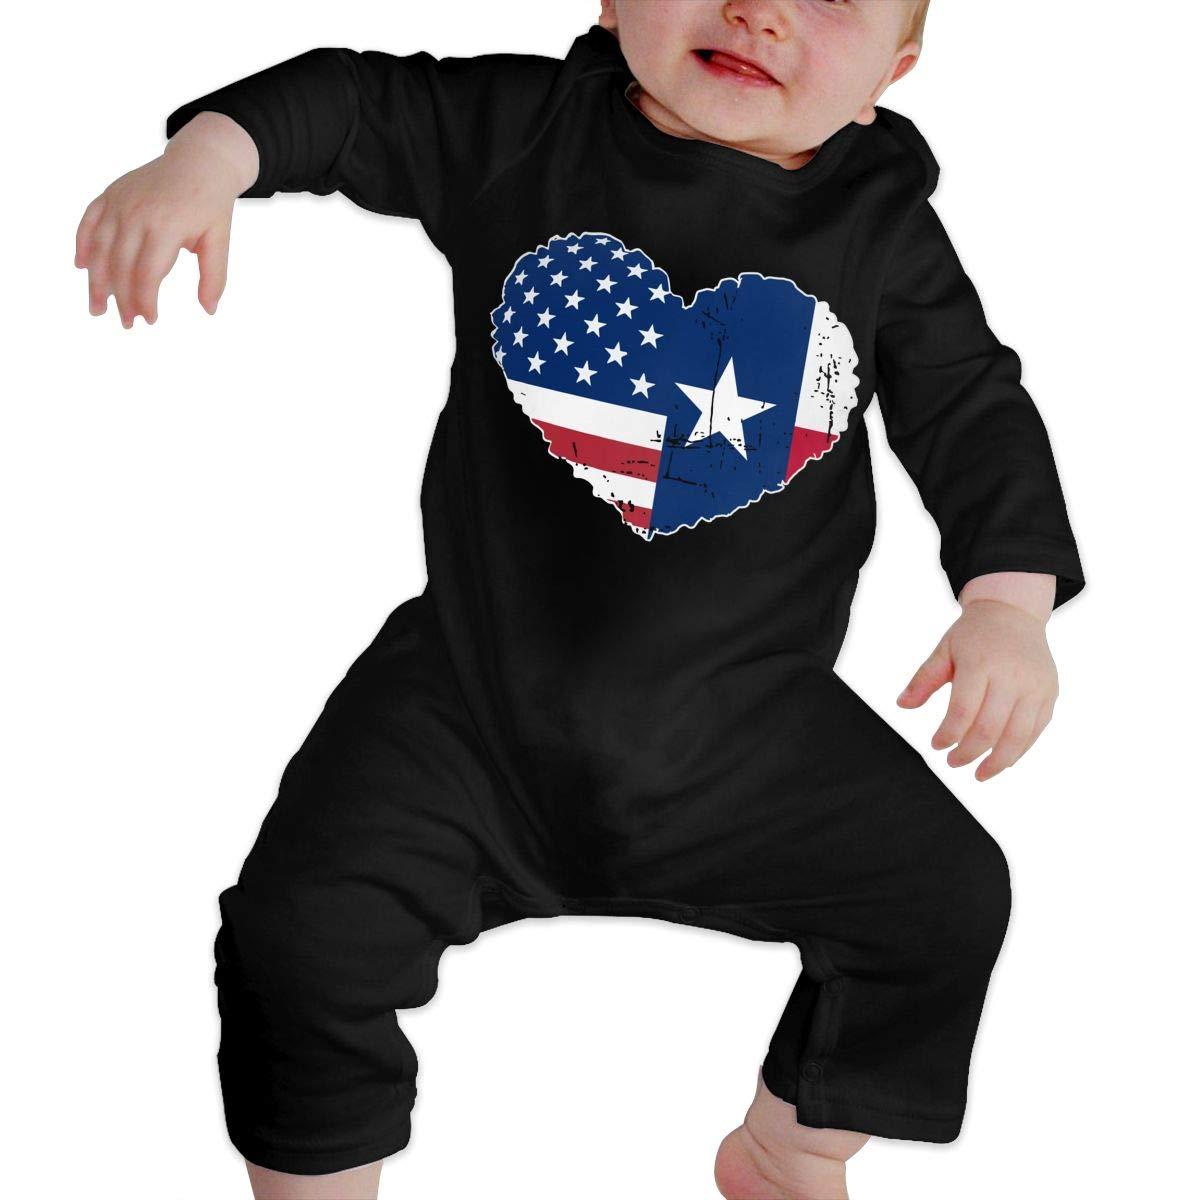 Toddler Baby Girls Rompers Sleeveless Cotton Jumpsuit,Leo Zodiac Bodysuit Autumn Pajamas